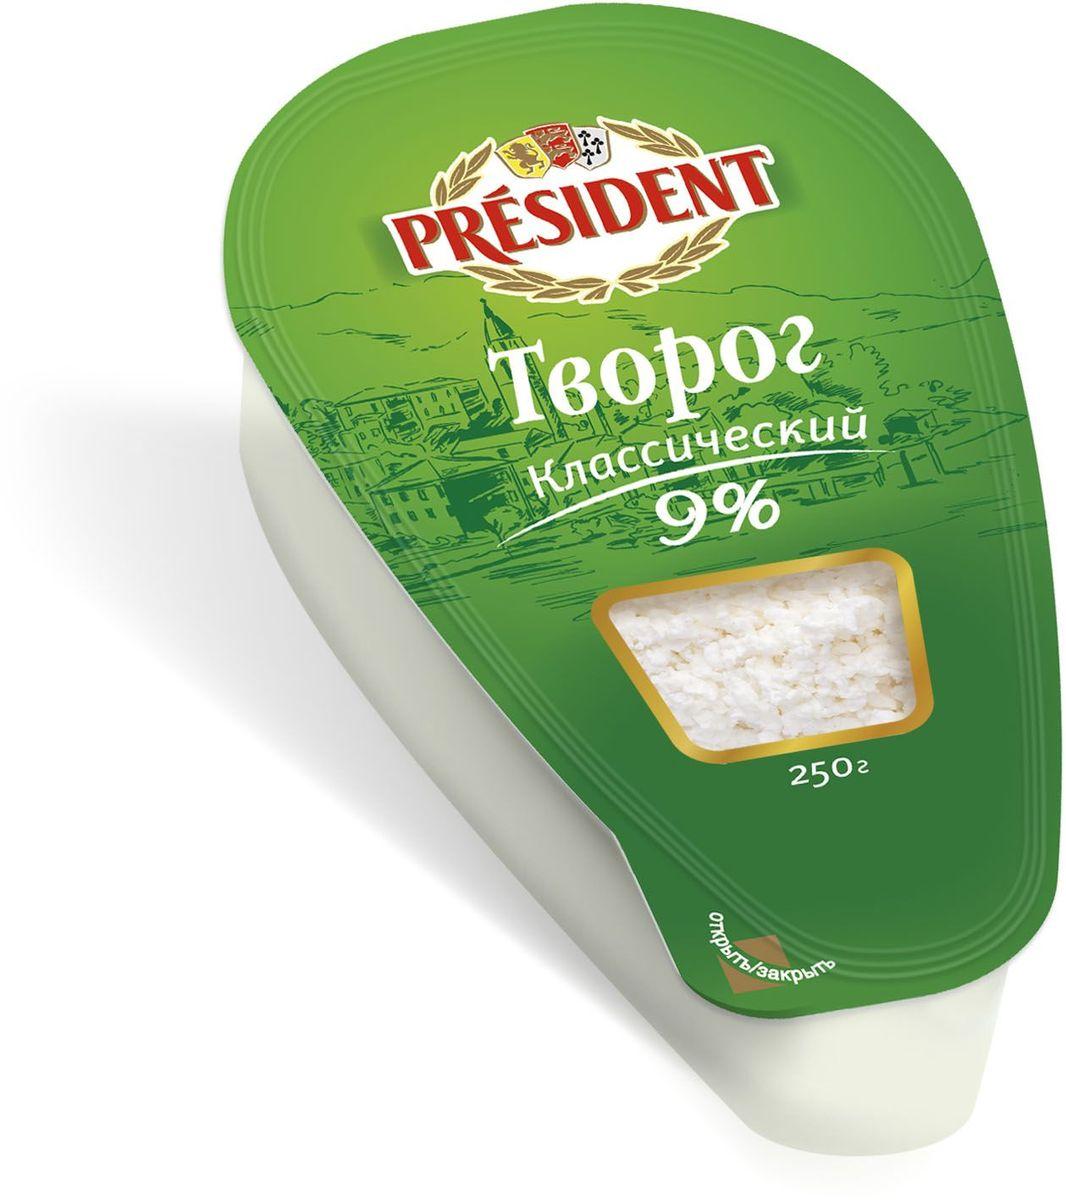 President Творог Классический 9%, 250 г творог милава 5